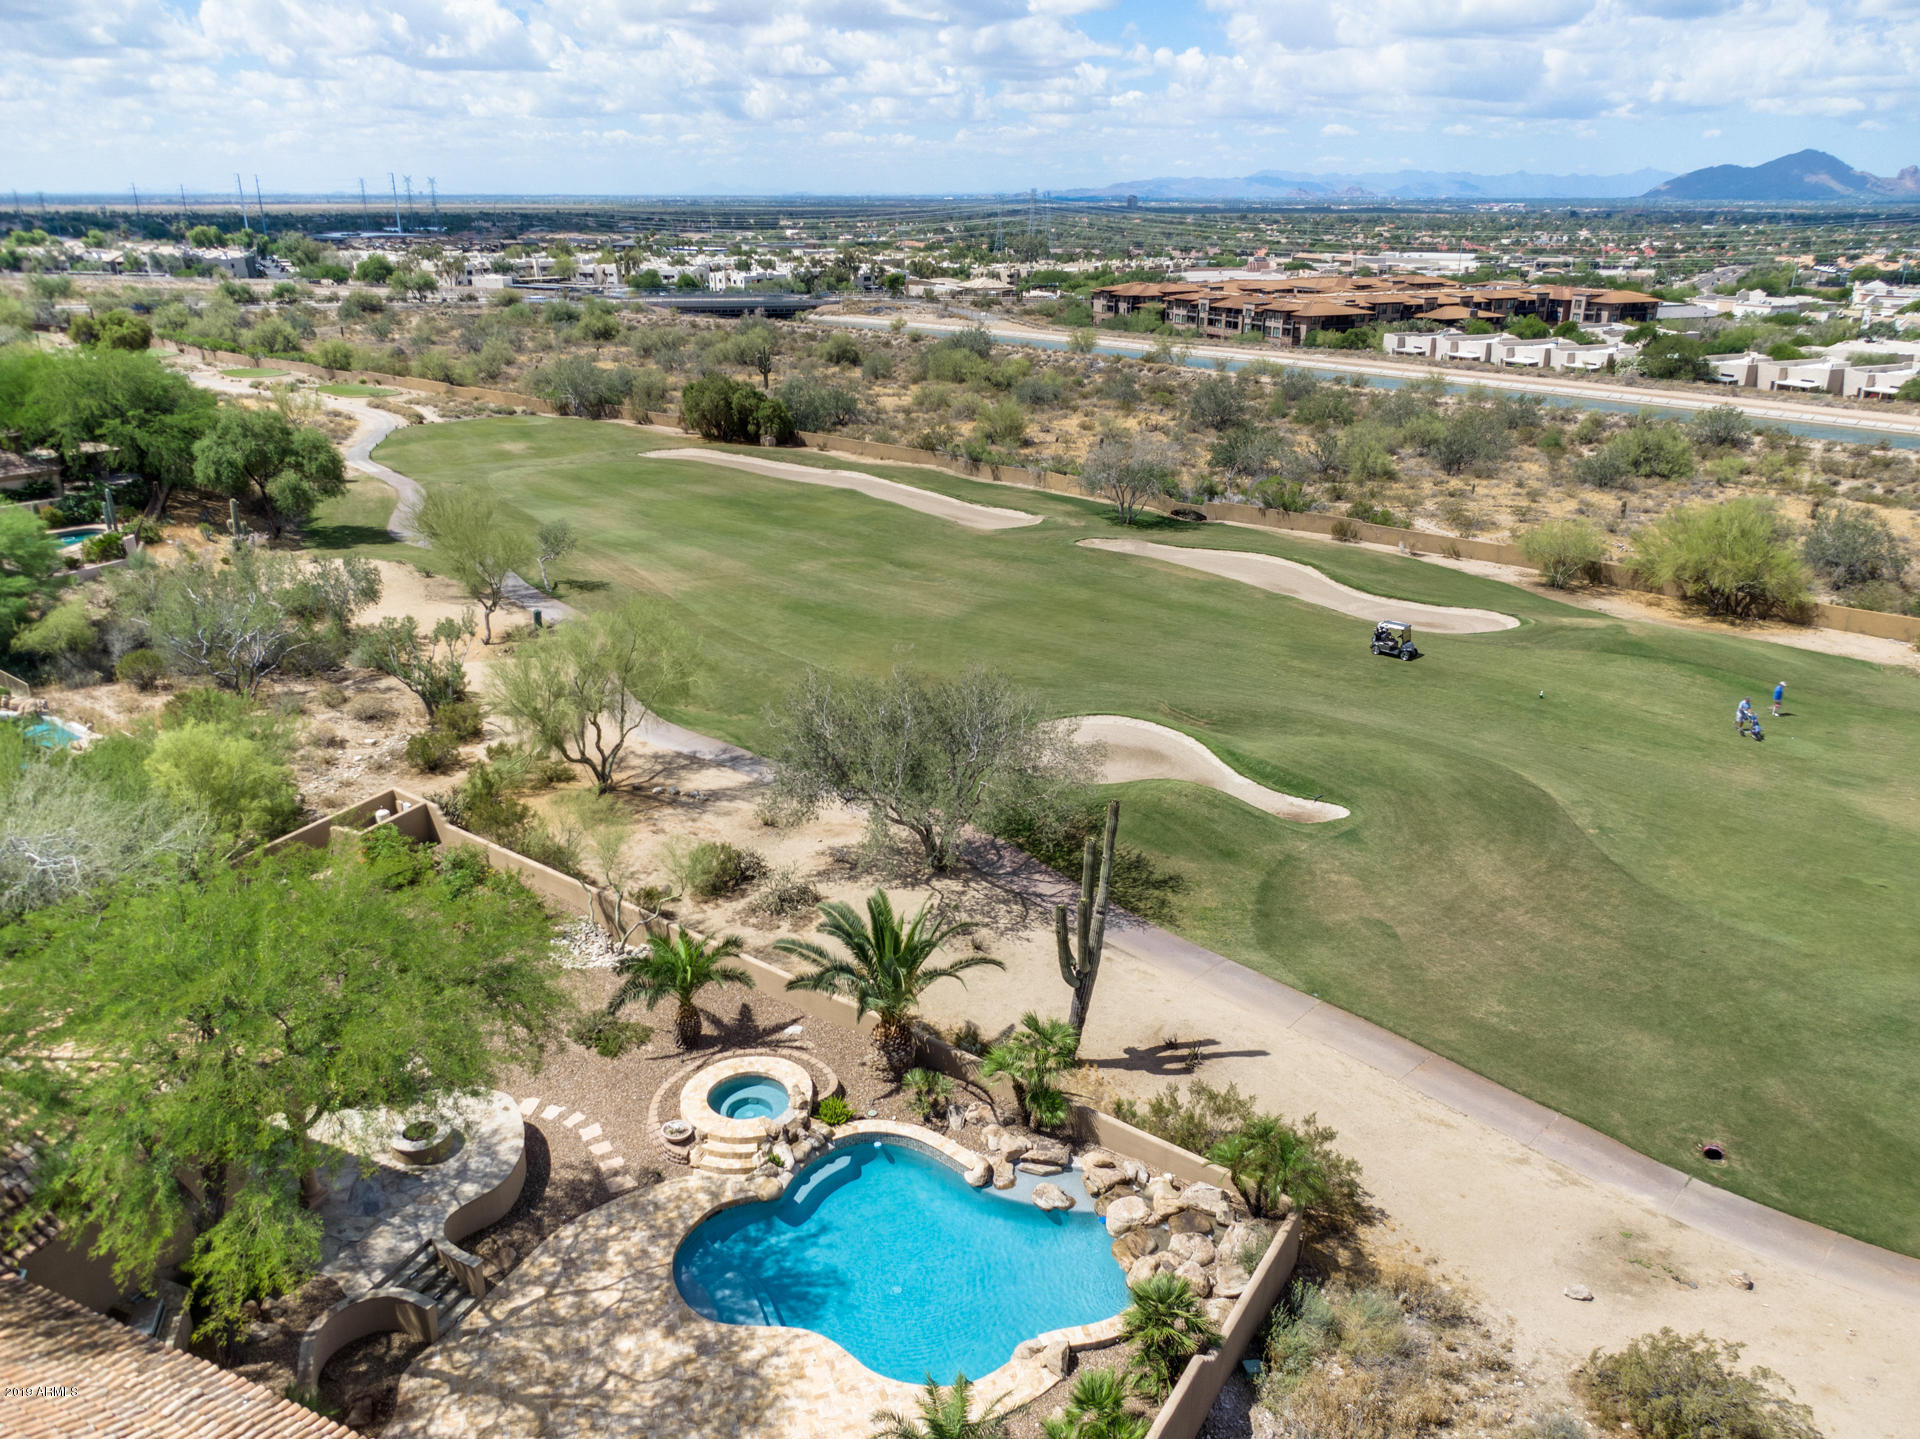 Photo of 11746 N 114TH Way, Scottsdale, AZ 85259